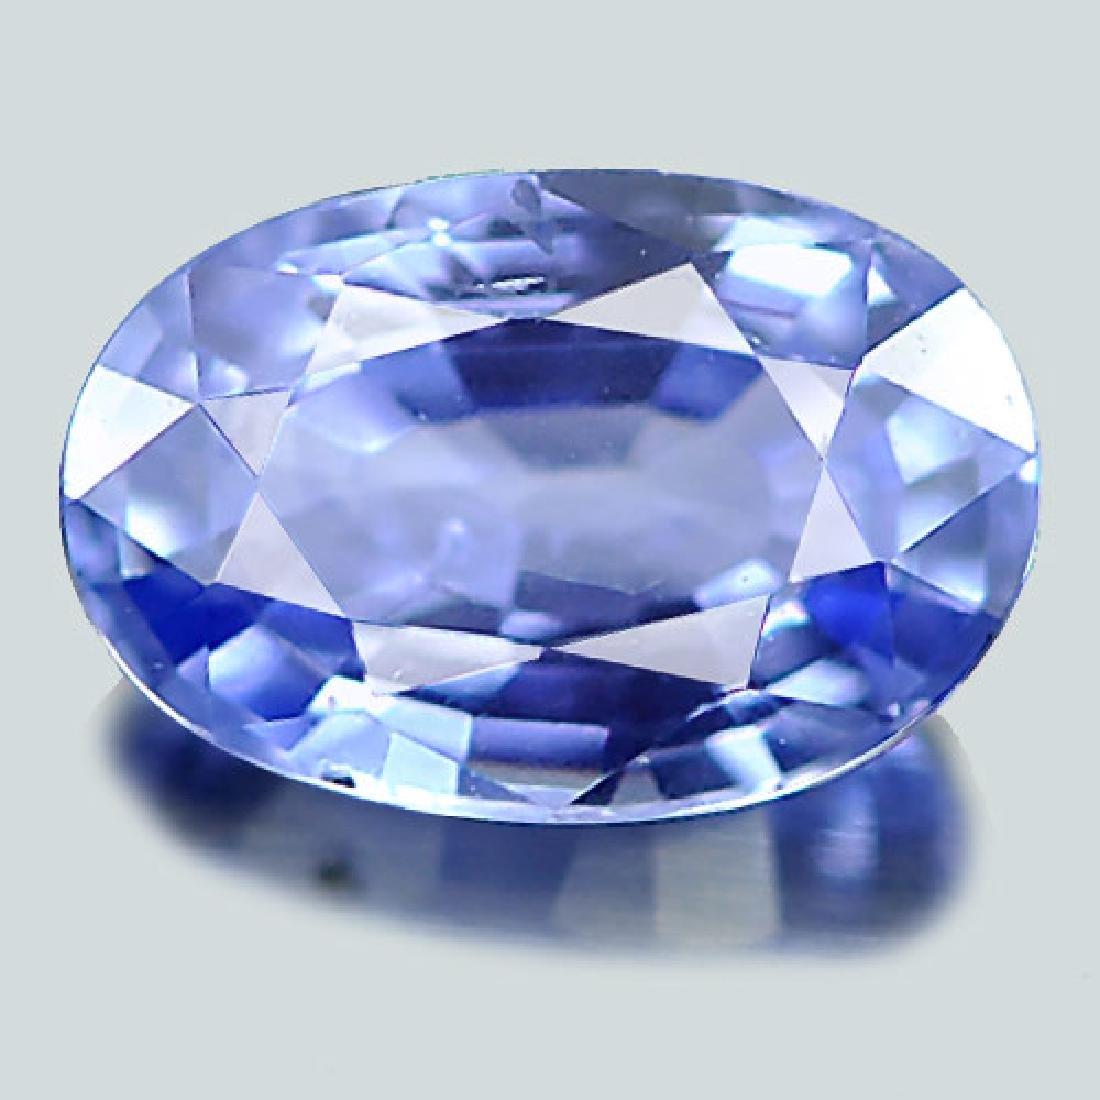 1.03 Ct. Natural Blue Ceylon Sapphire Oval Shape - 2